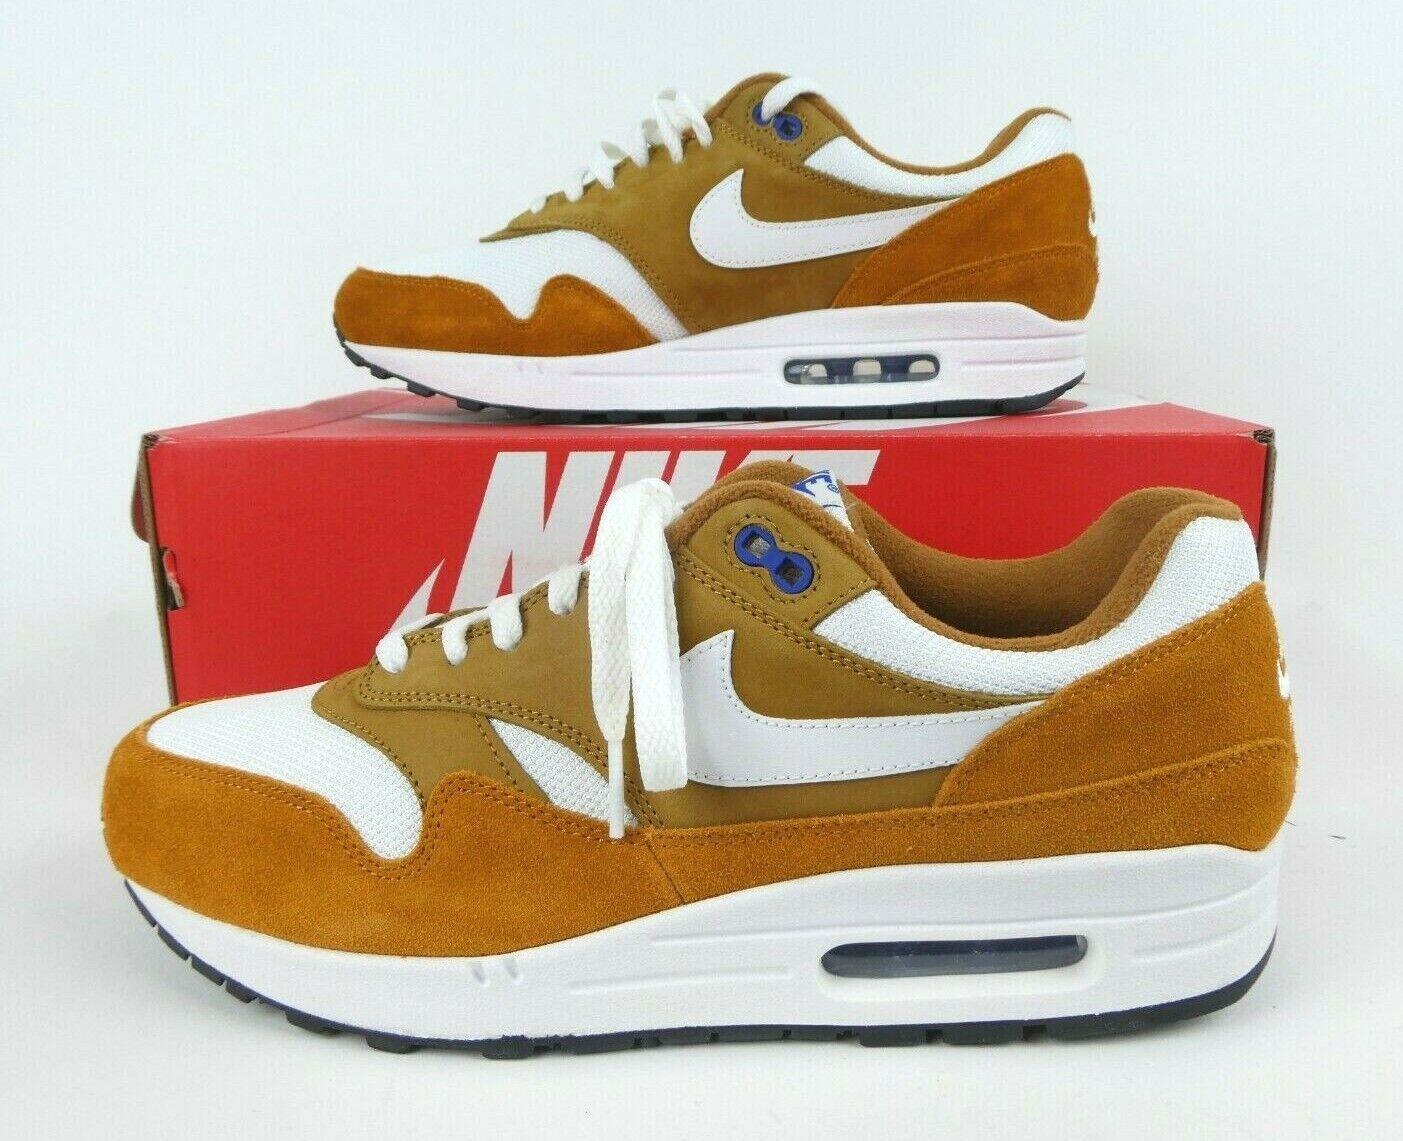 Nike Air Max 1 Premium Retro Mens Size 9.5 Dark Curry 908366-700